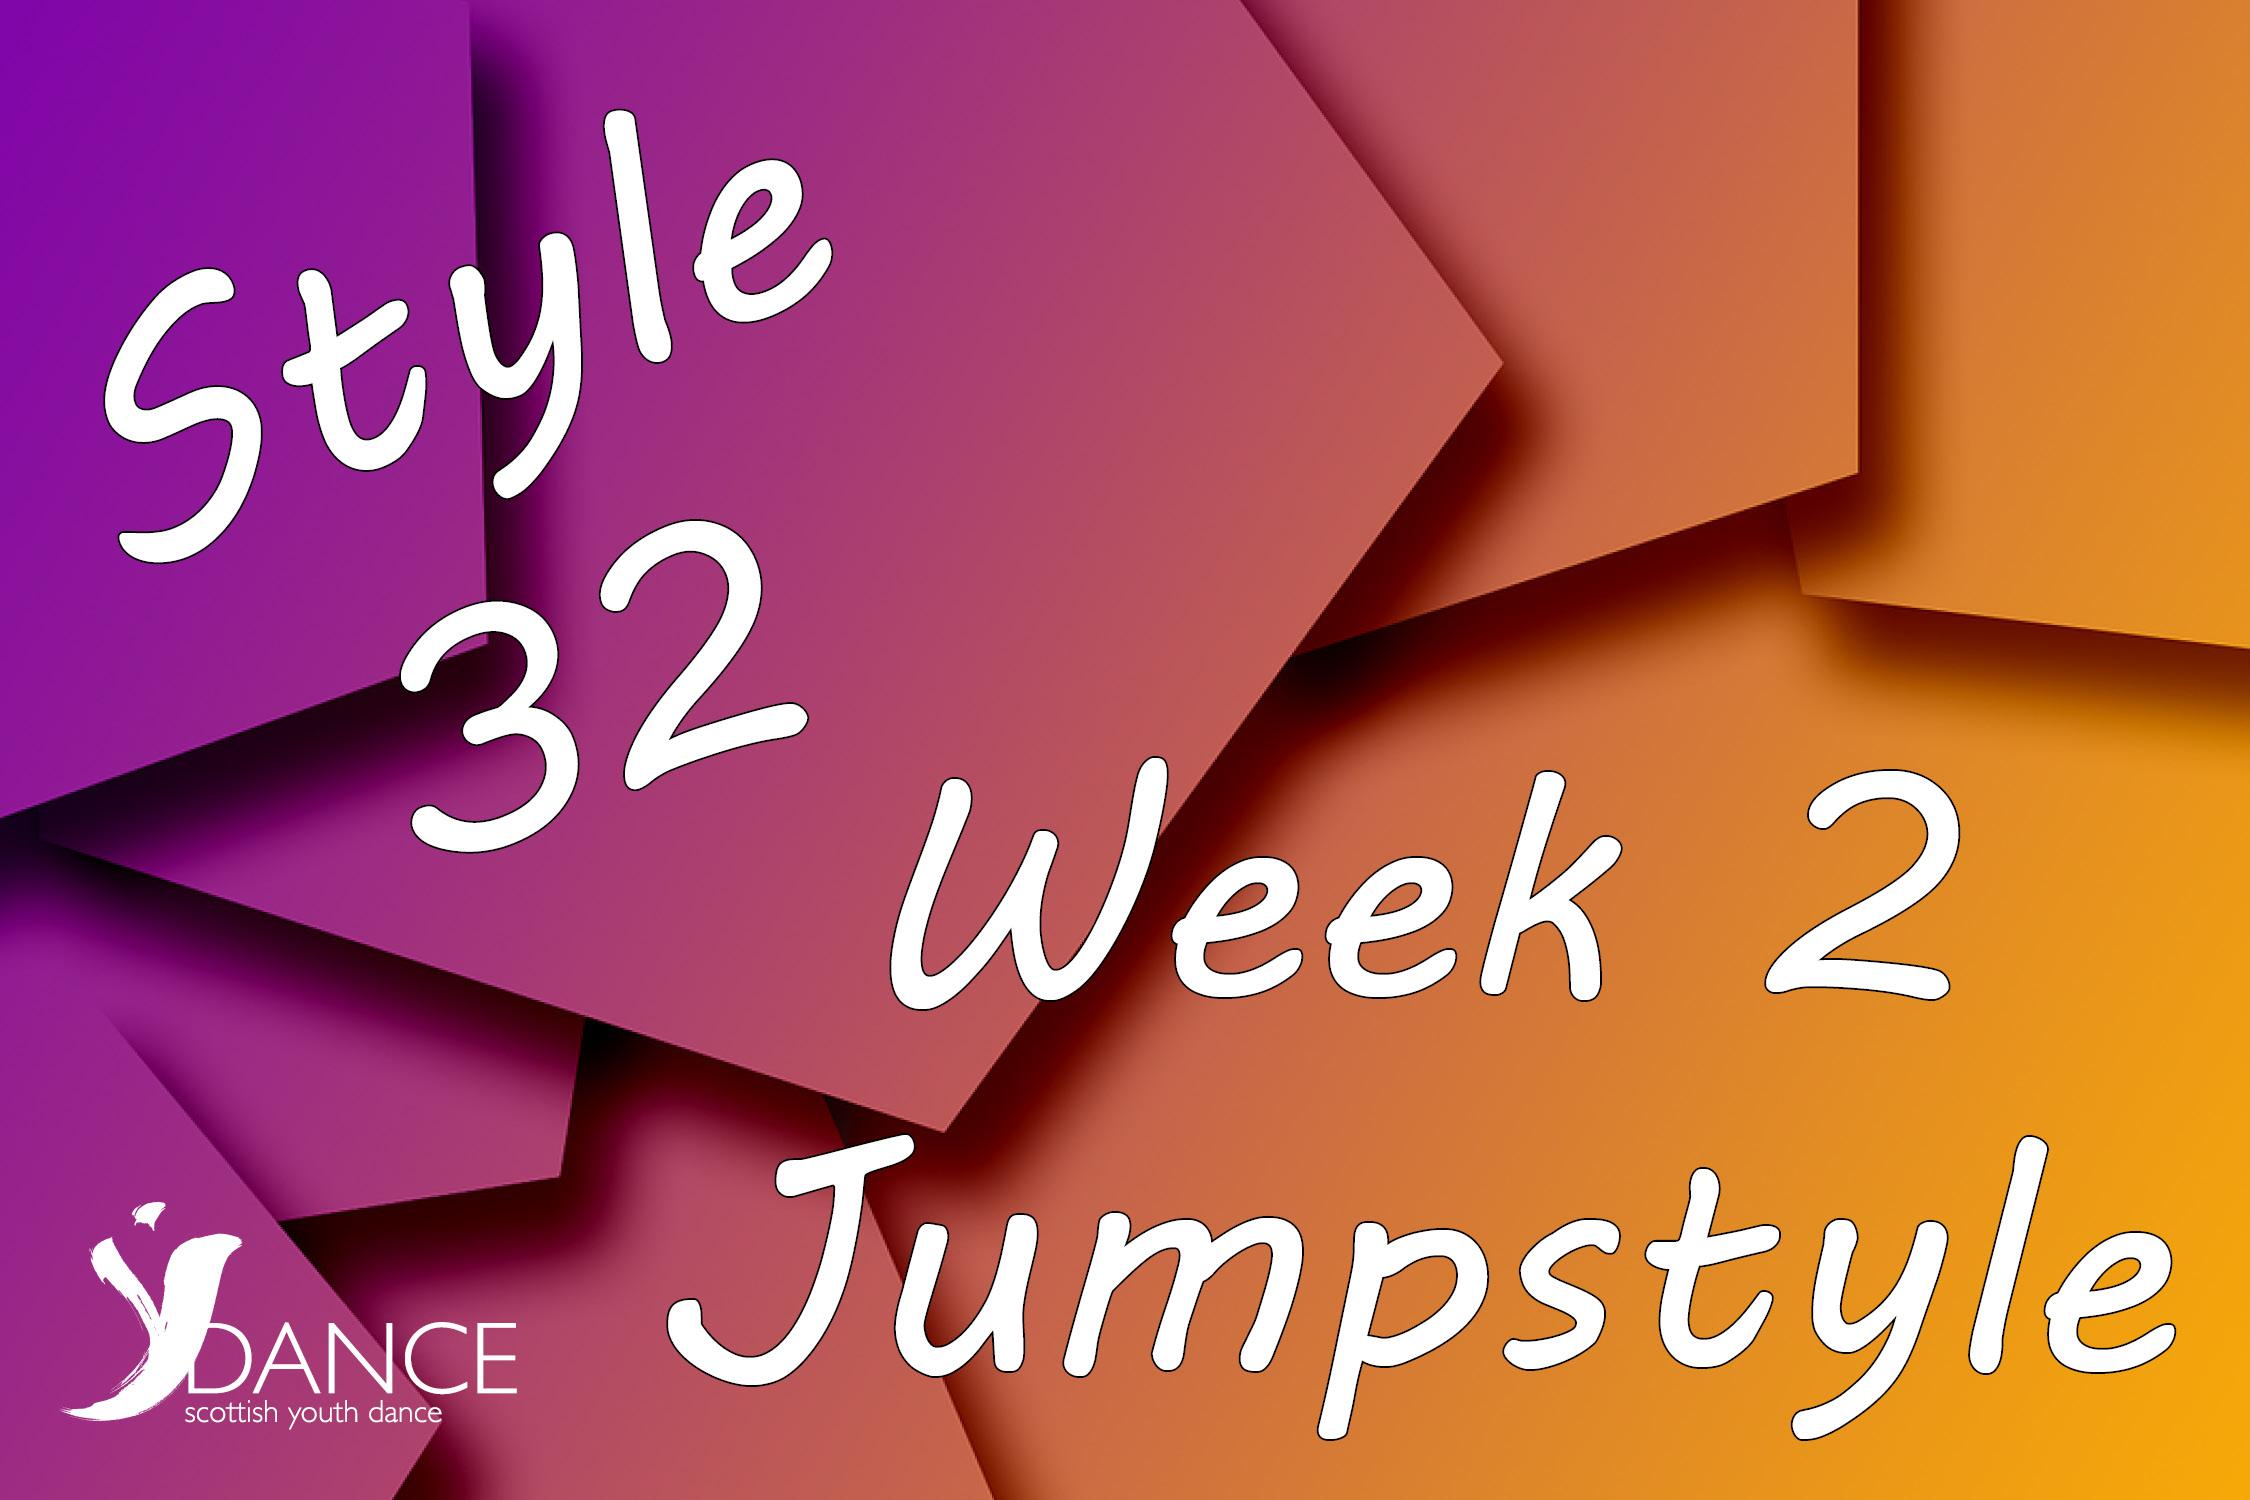 Style32 - wk2 - Jumpstyle